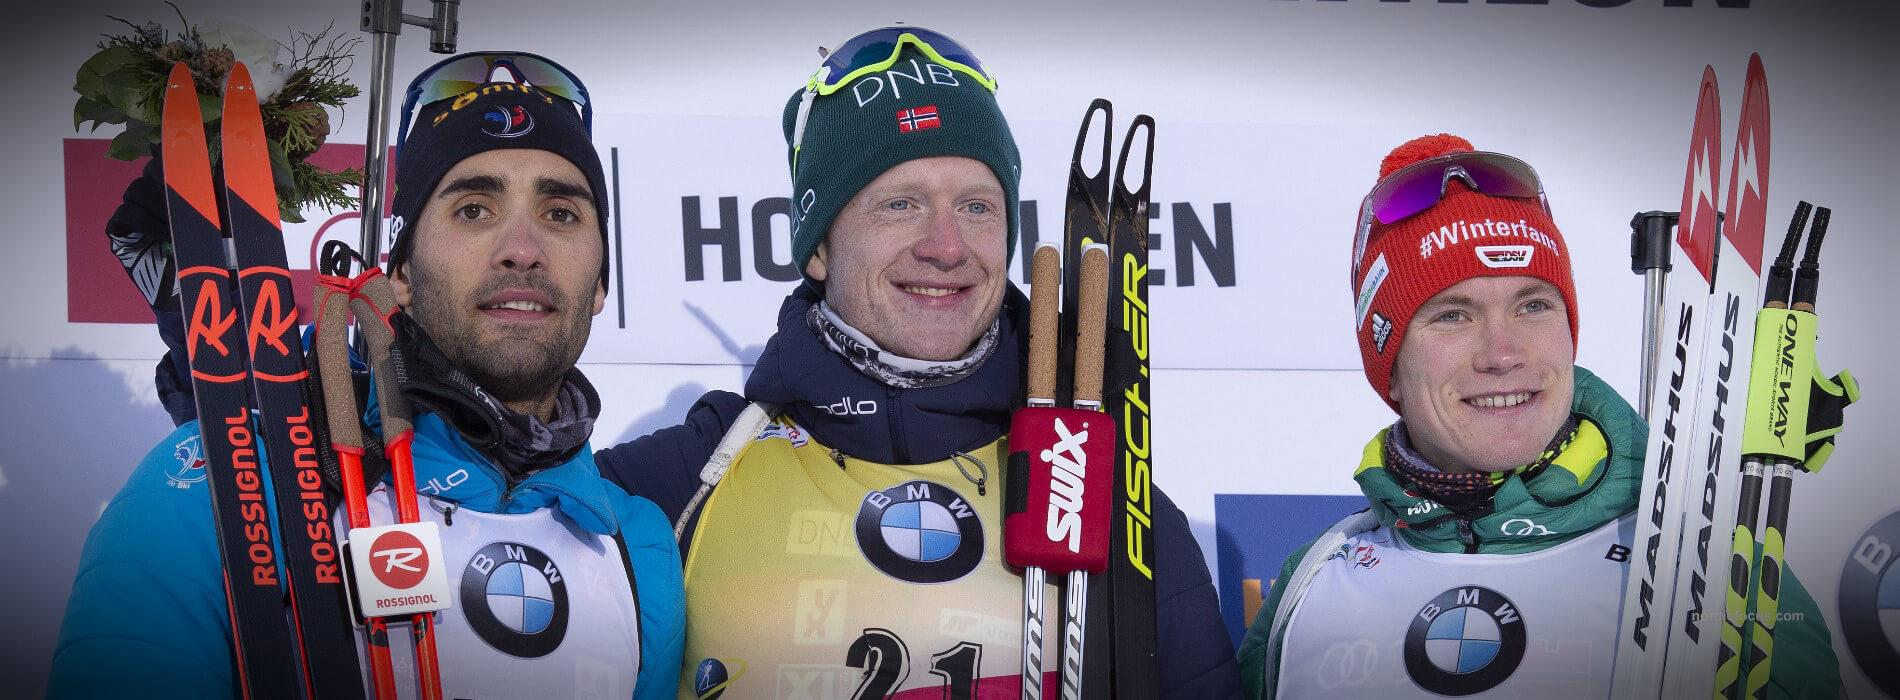 Martin Fourcade, Benedikt Doll, Johannes Thingnes Boe